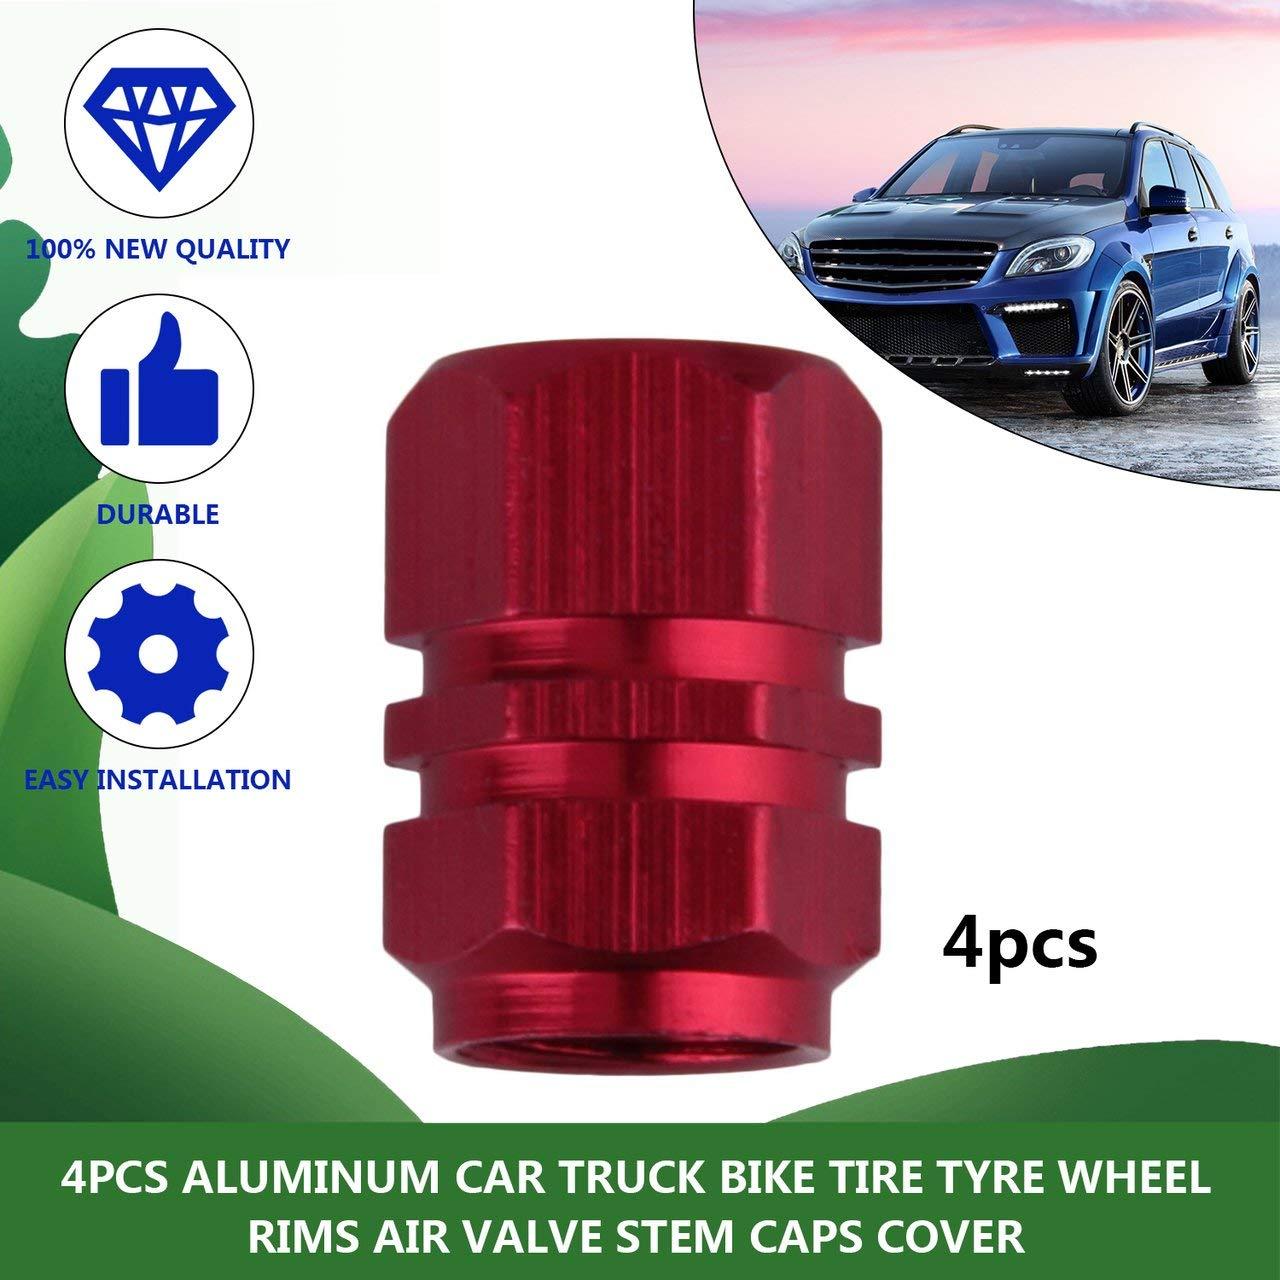 4 Pcs Compact Aluminum Car Truck Motocycle Bike Tire Tyre Wheel Rims Air Valve Stem Caps Cover Tyres Accessories